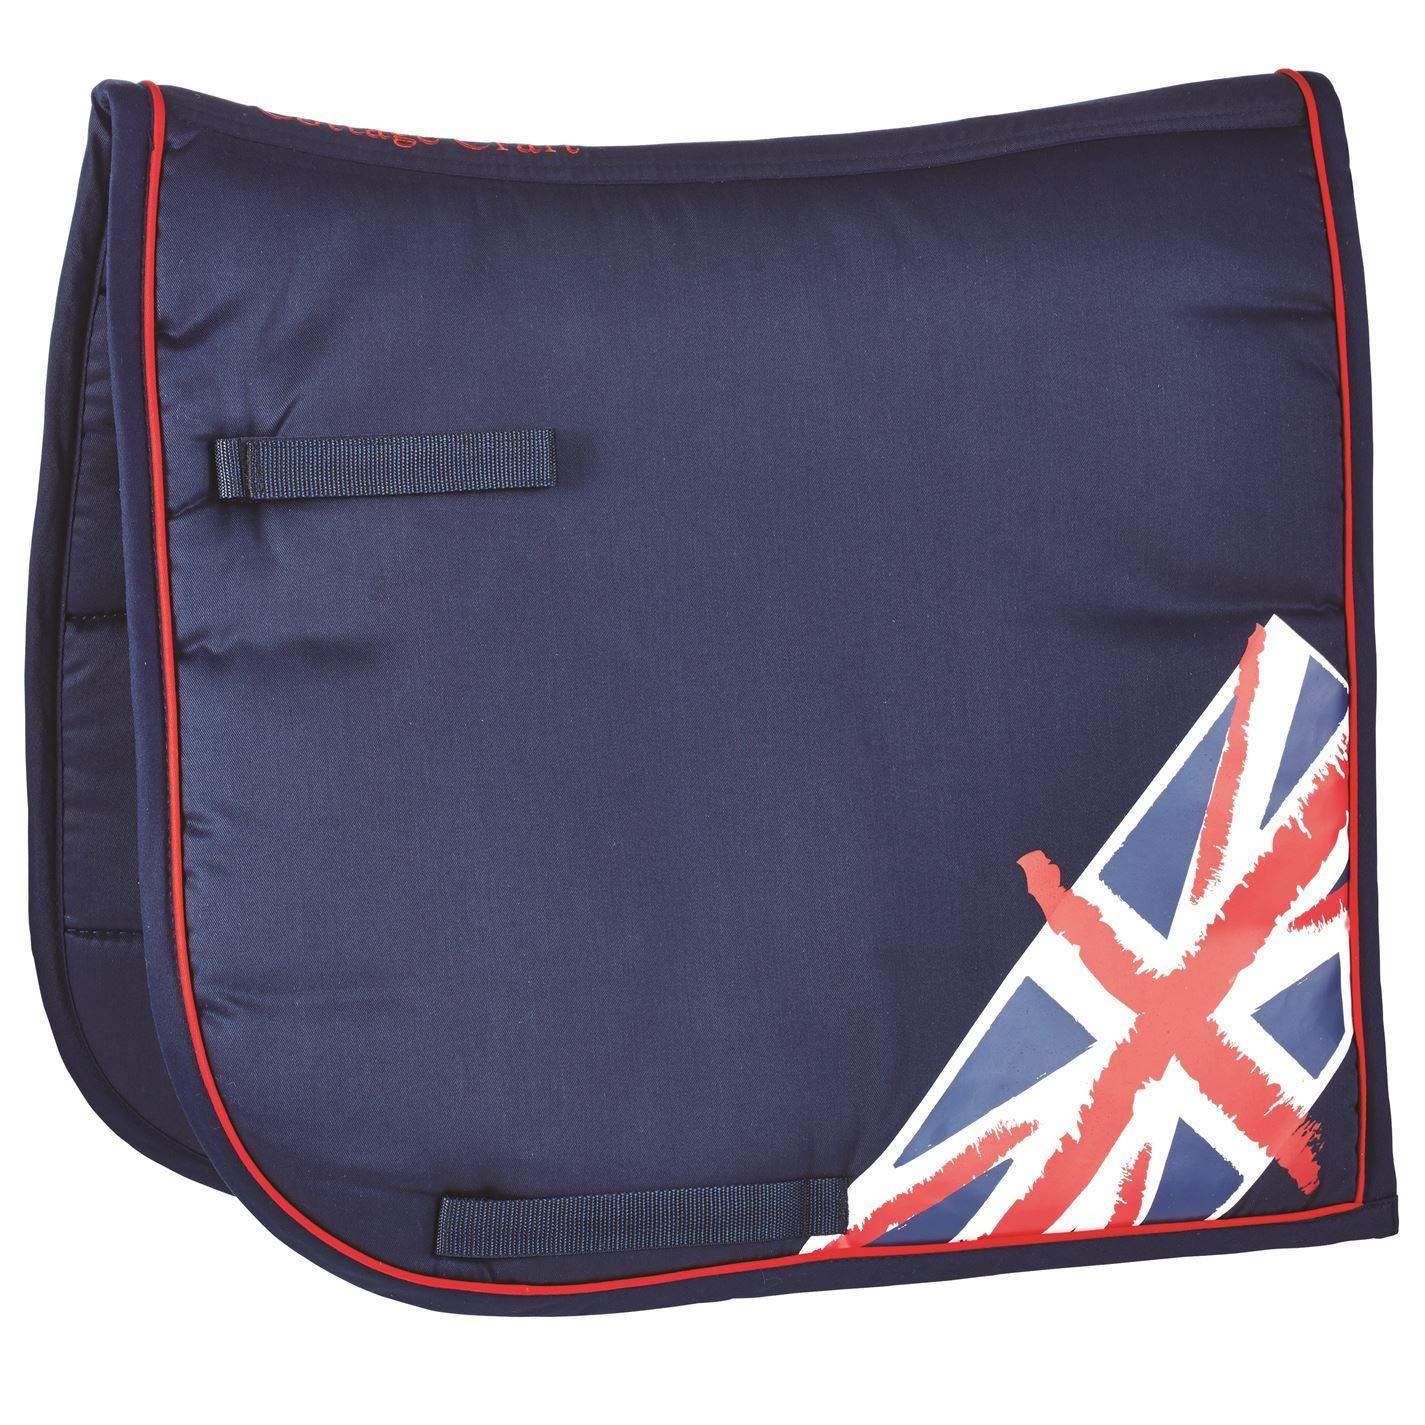 bluee Red PonyCottage Craft Union Jack Saddle Pad Numnah Cloth Horse Riding Tack